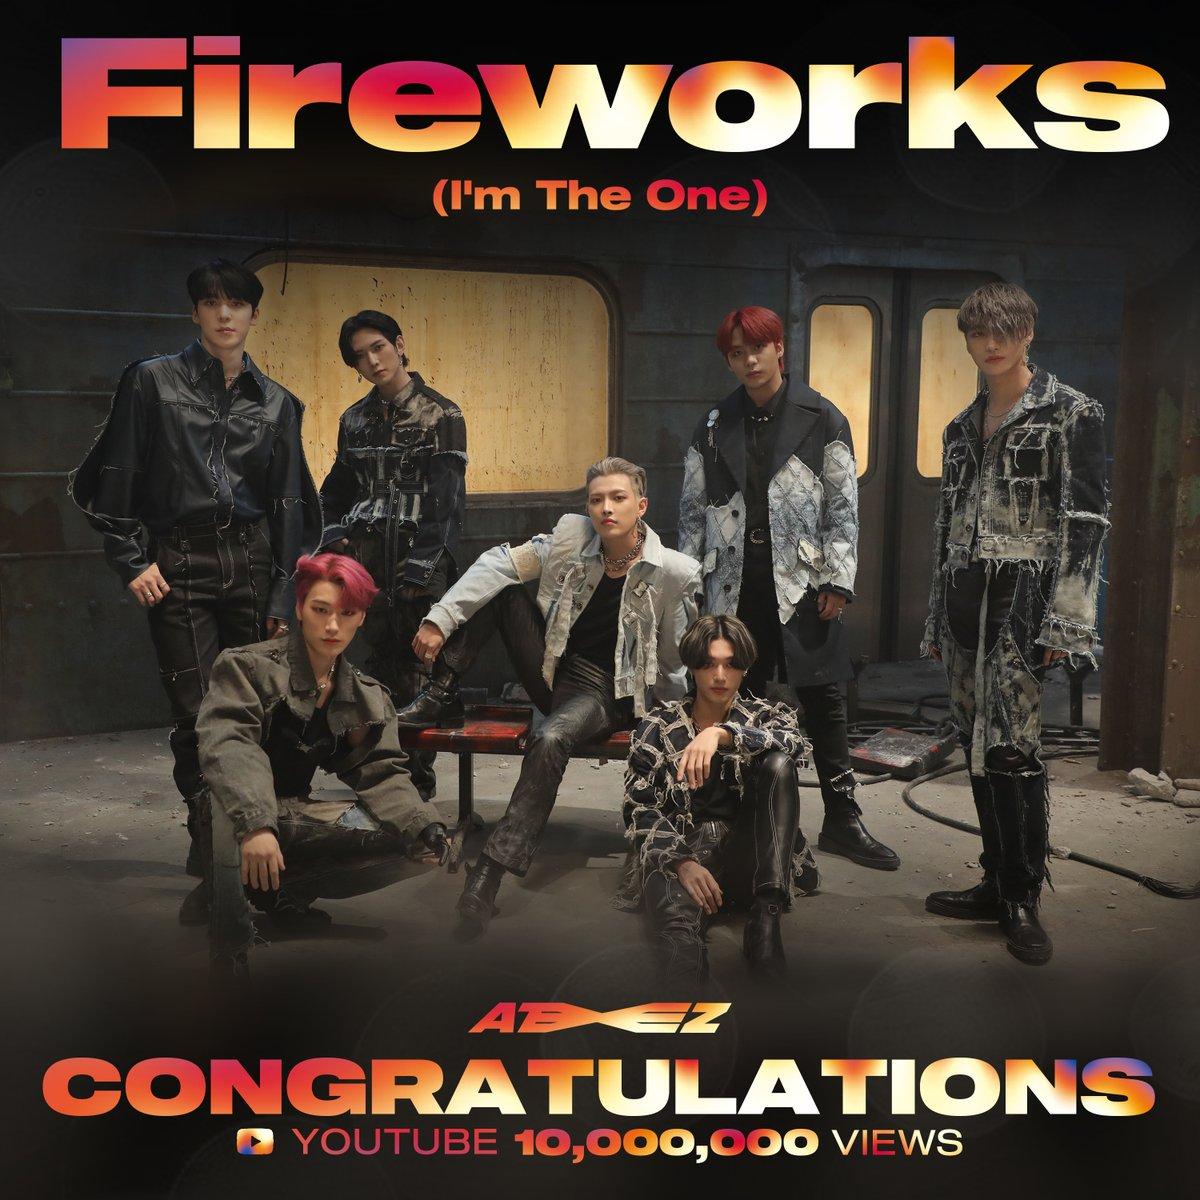 [📢] ATEEZ(에이티즈) - '불놀이야 (I'm The One)' Official MV 10,000,000 Views  ⠀ '불놀이야' 뮤직비디오의 유튜브 조회수 1000만회 달성!👏  에이티니 여러분의 꾸준한 사랑과 관심 감사합니다😍  ⠀ ▶  ⠀ #불놀이야 #Fireworks #ATEEZ #에이티즈